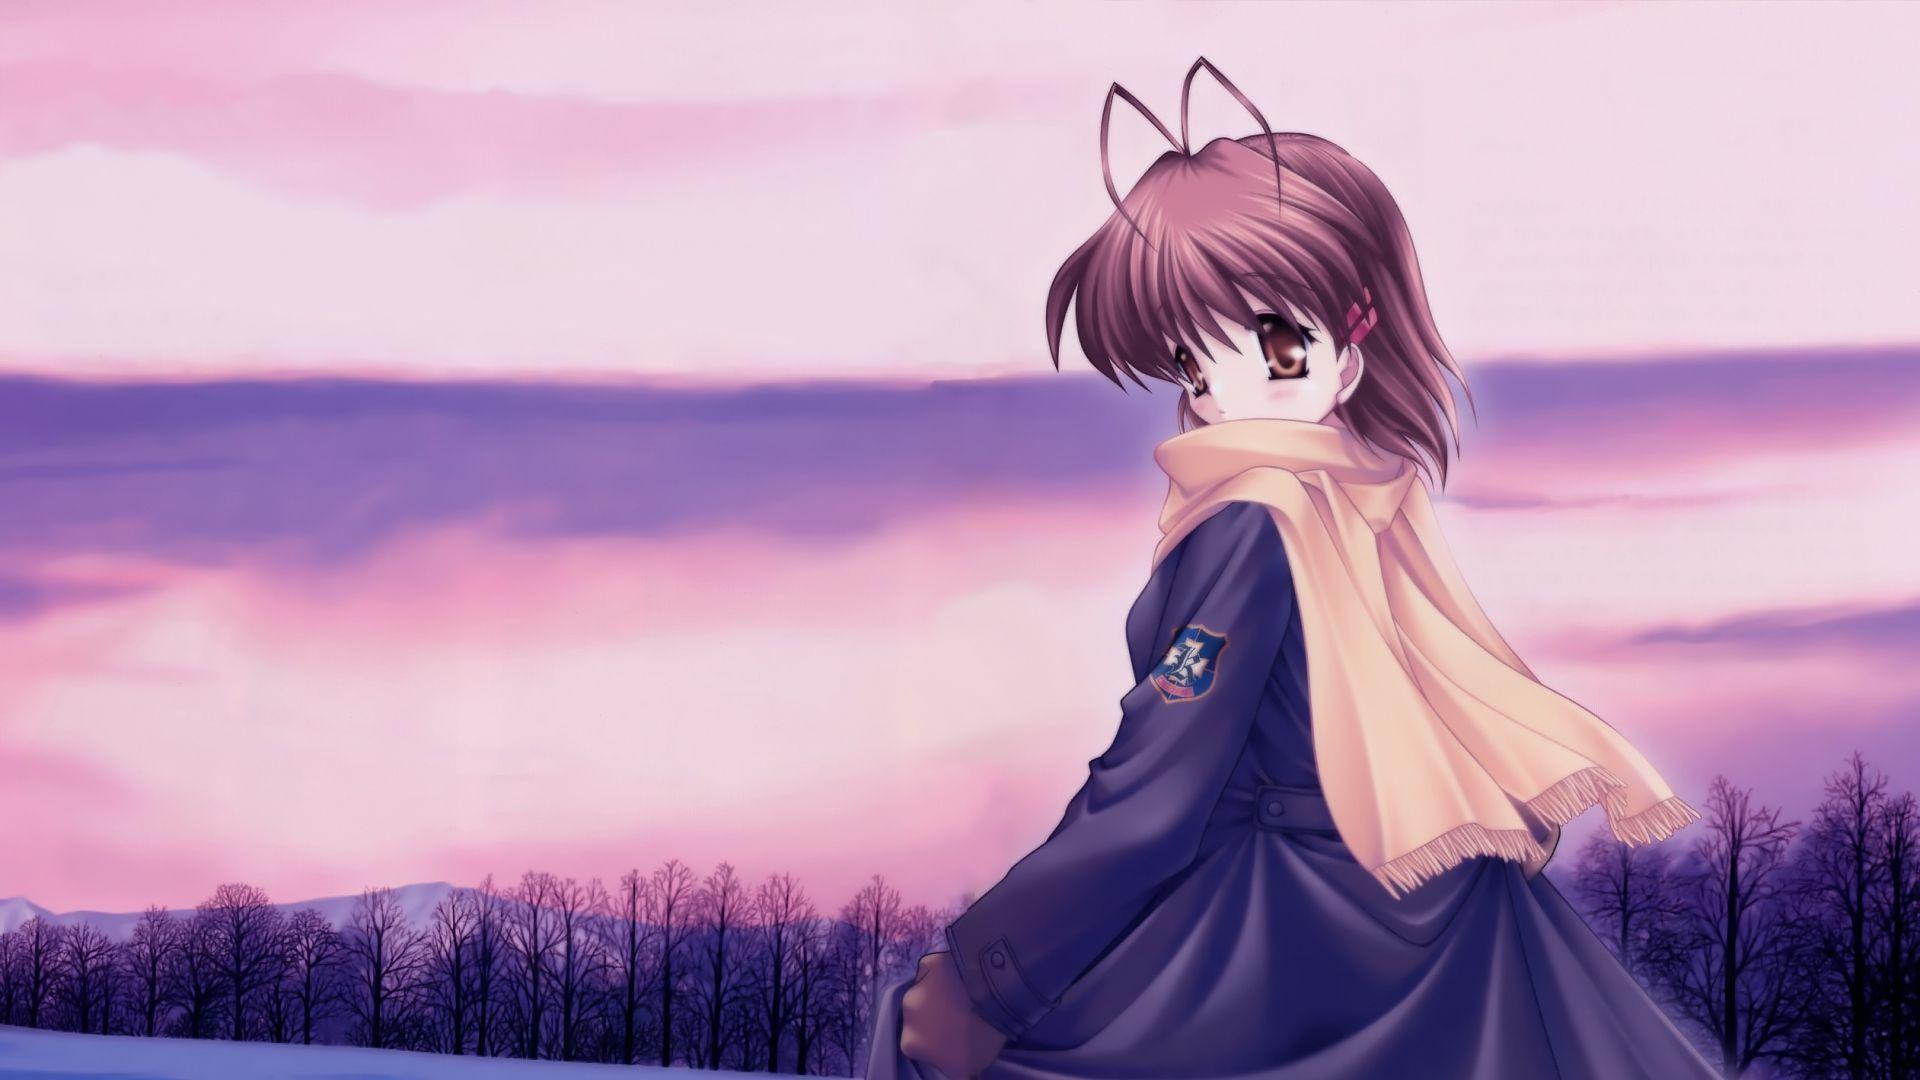 Clannad Wallpaper Anime Clannad Girl Wallpaper